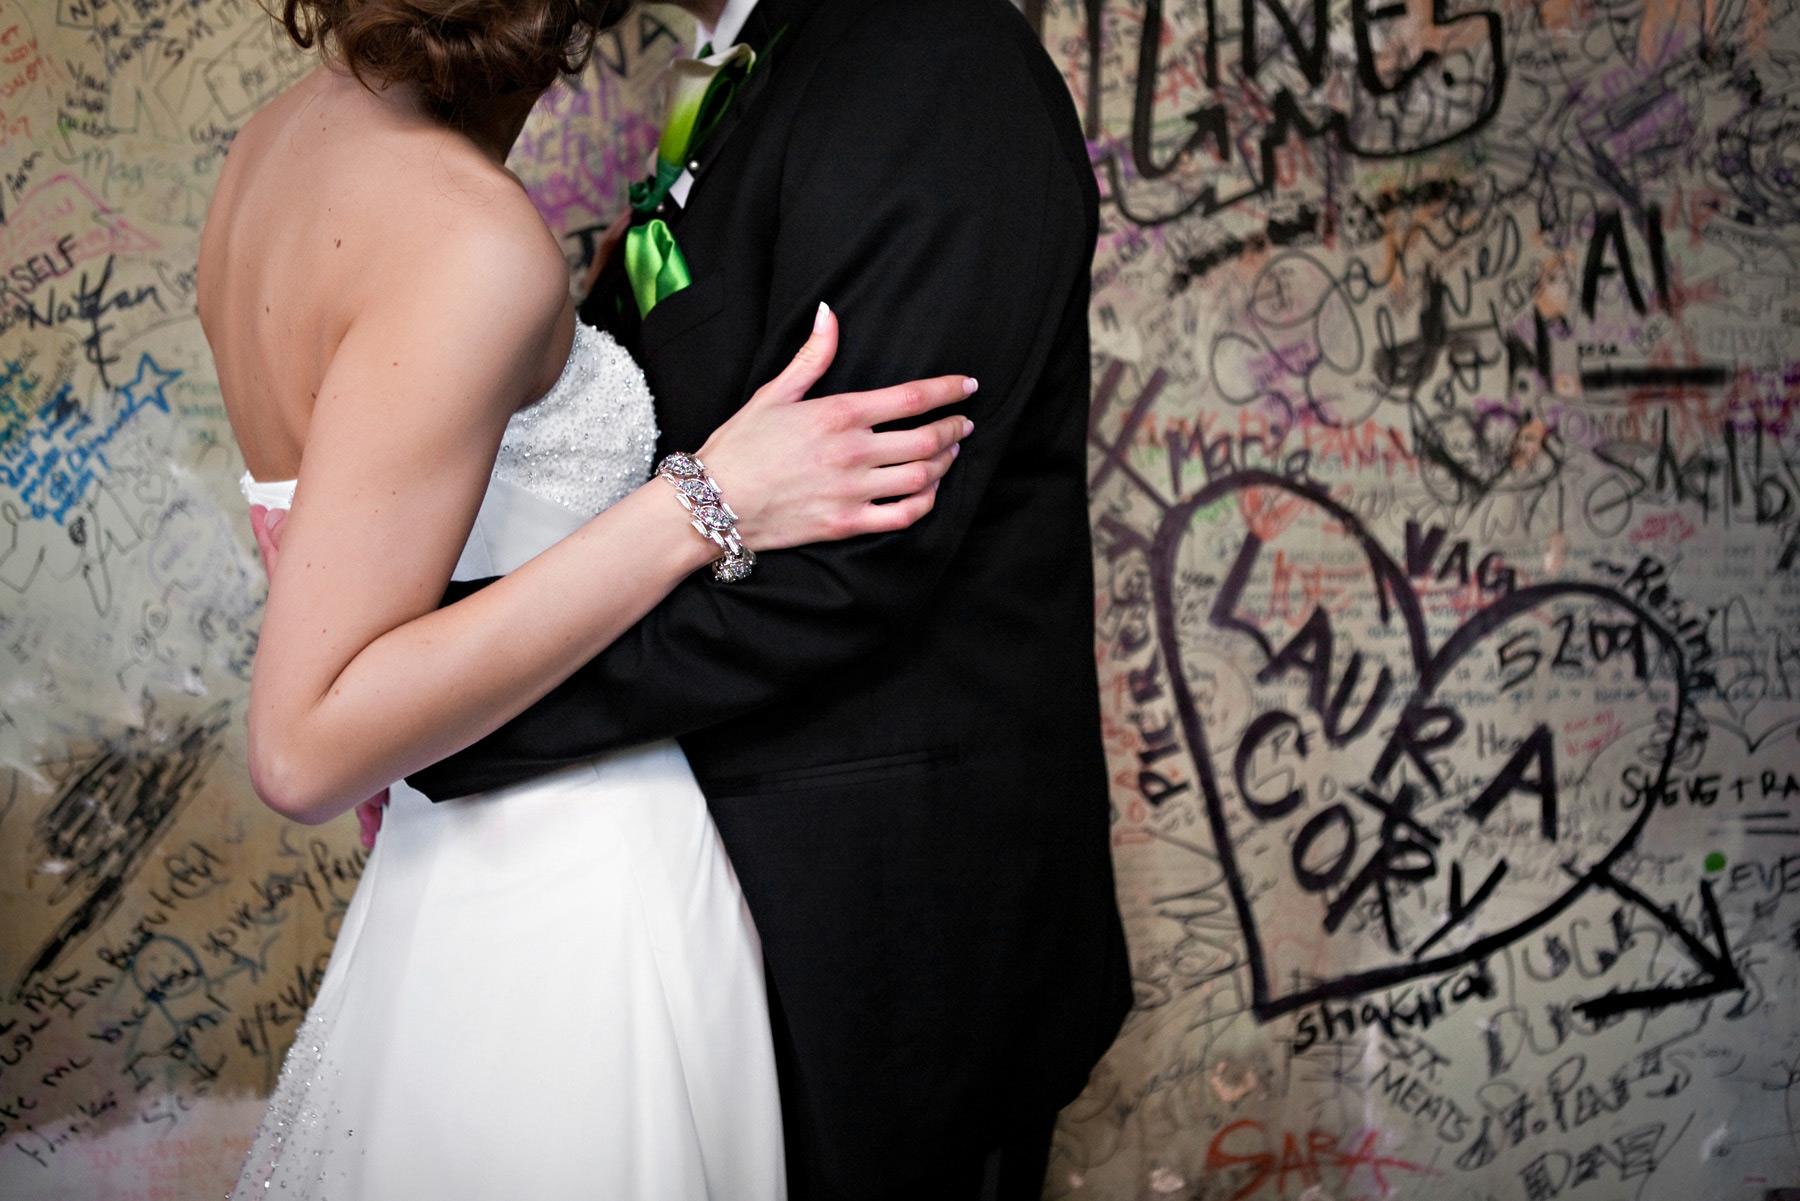 minnesota-wedding-photographers-mark-kegans-915.jpg